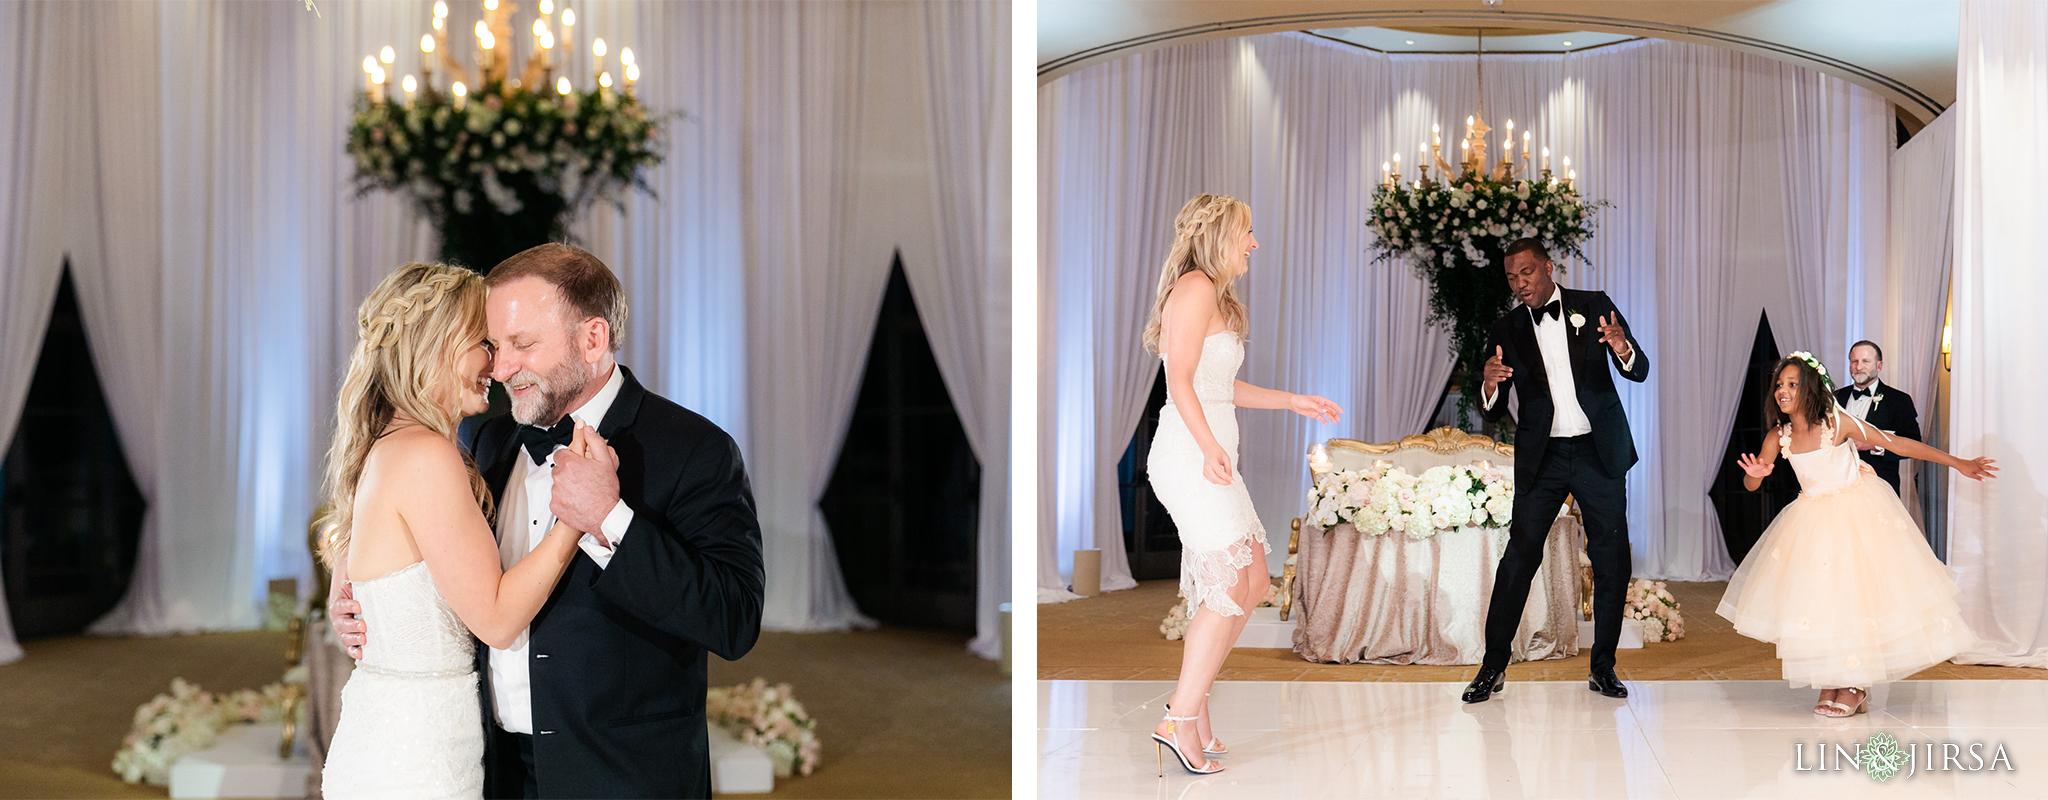 29 Pelican Hill Resort Orange County Wedding Photographer